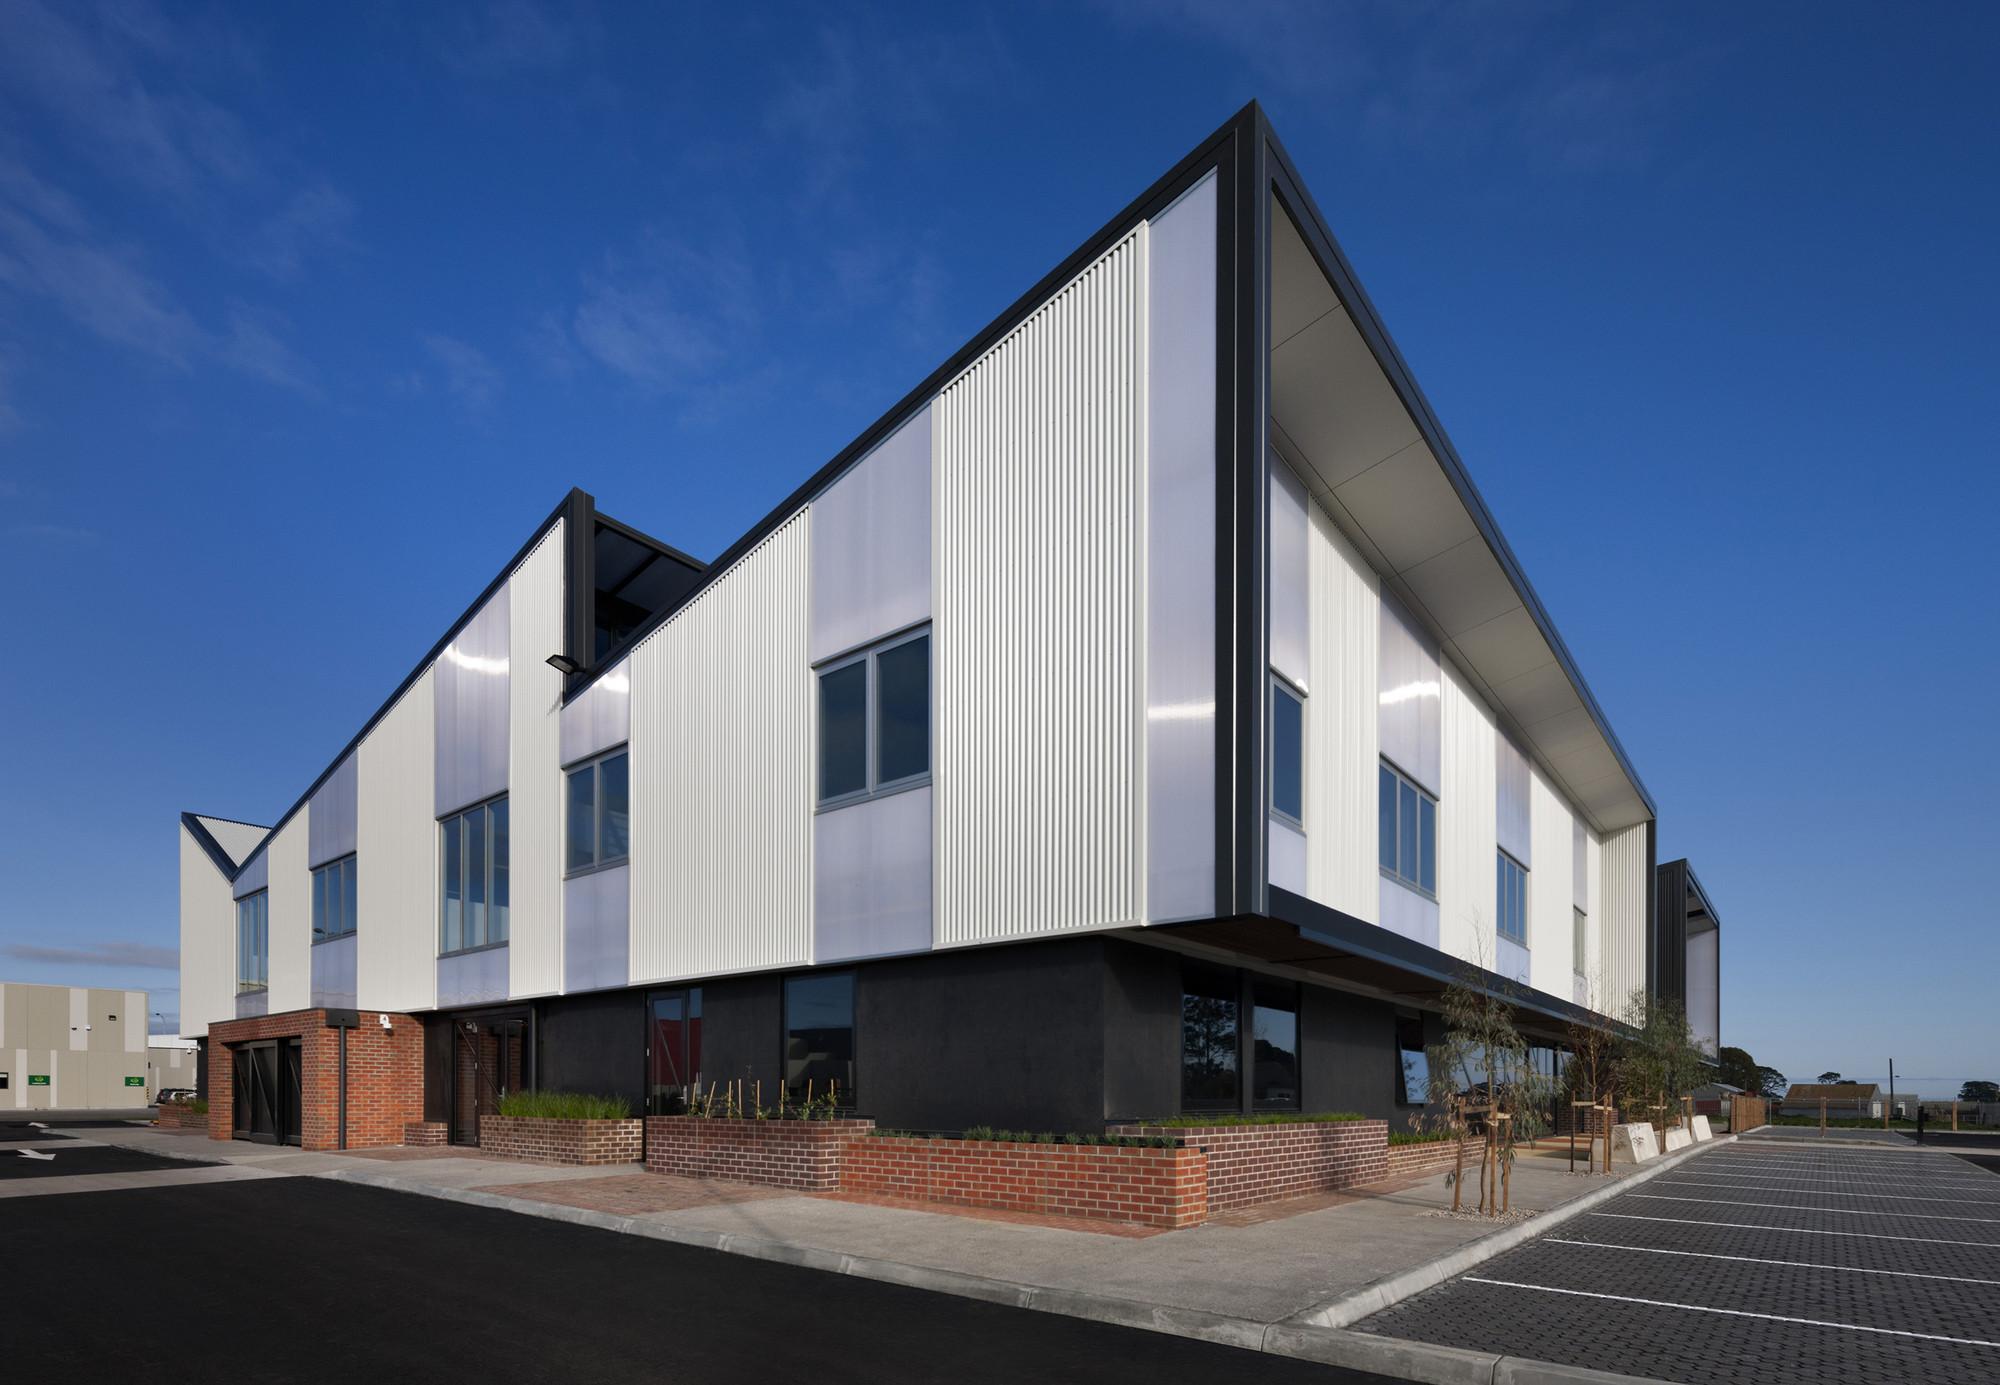 Ballarat Community Health Primary Care Centre / DesignInc, © Dianna Snape